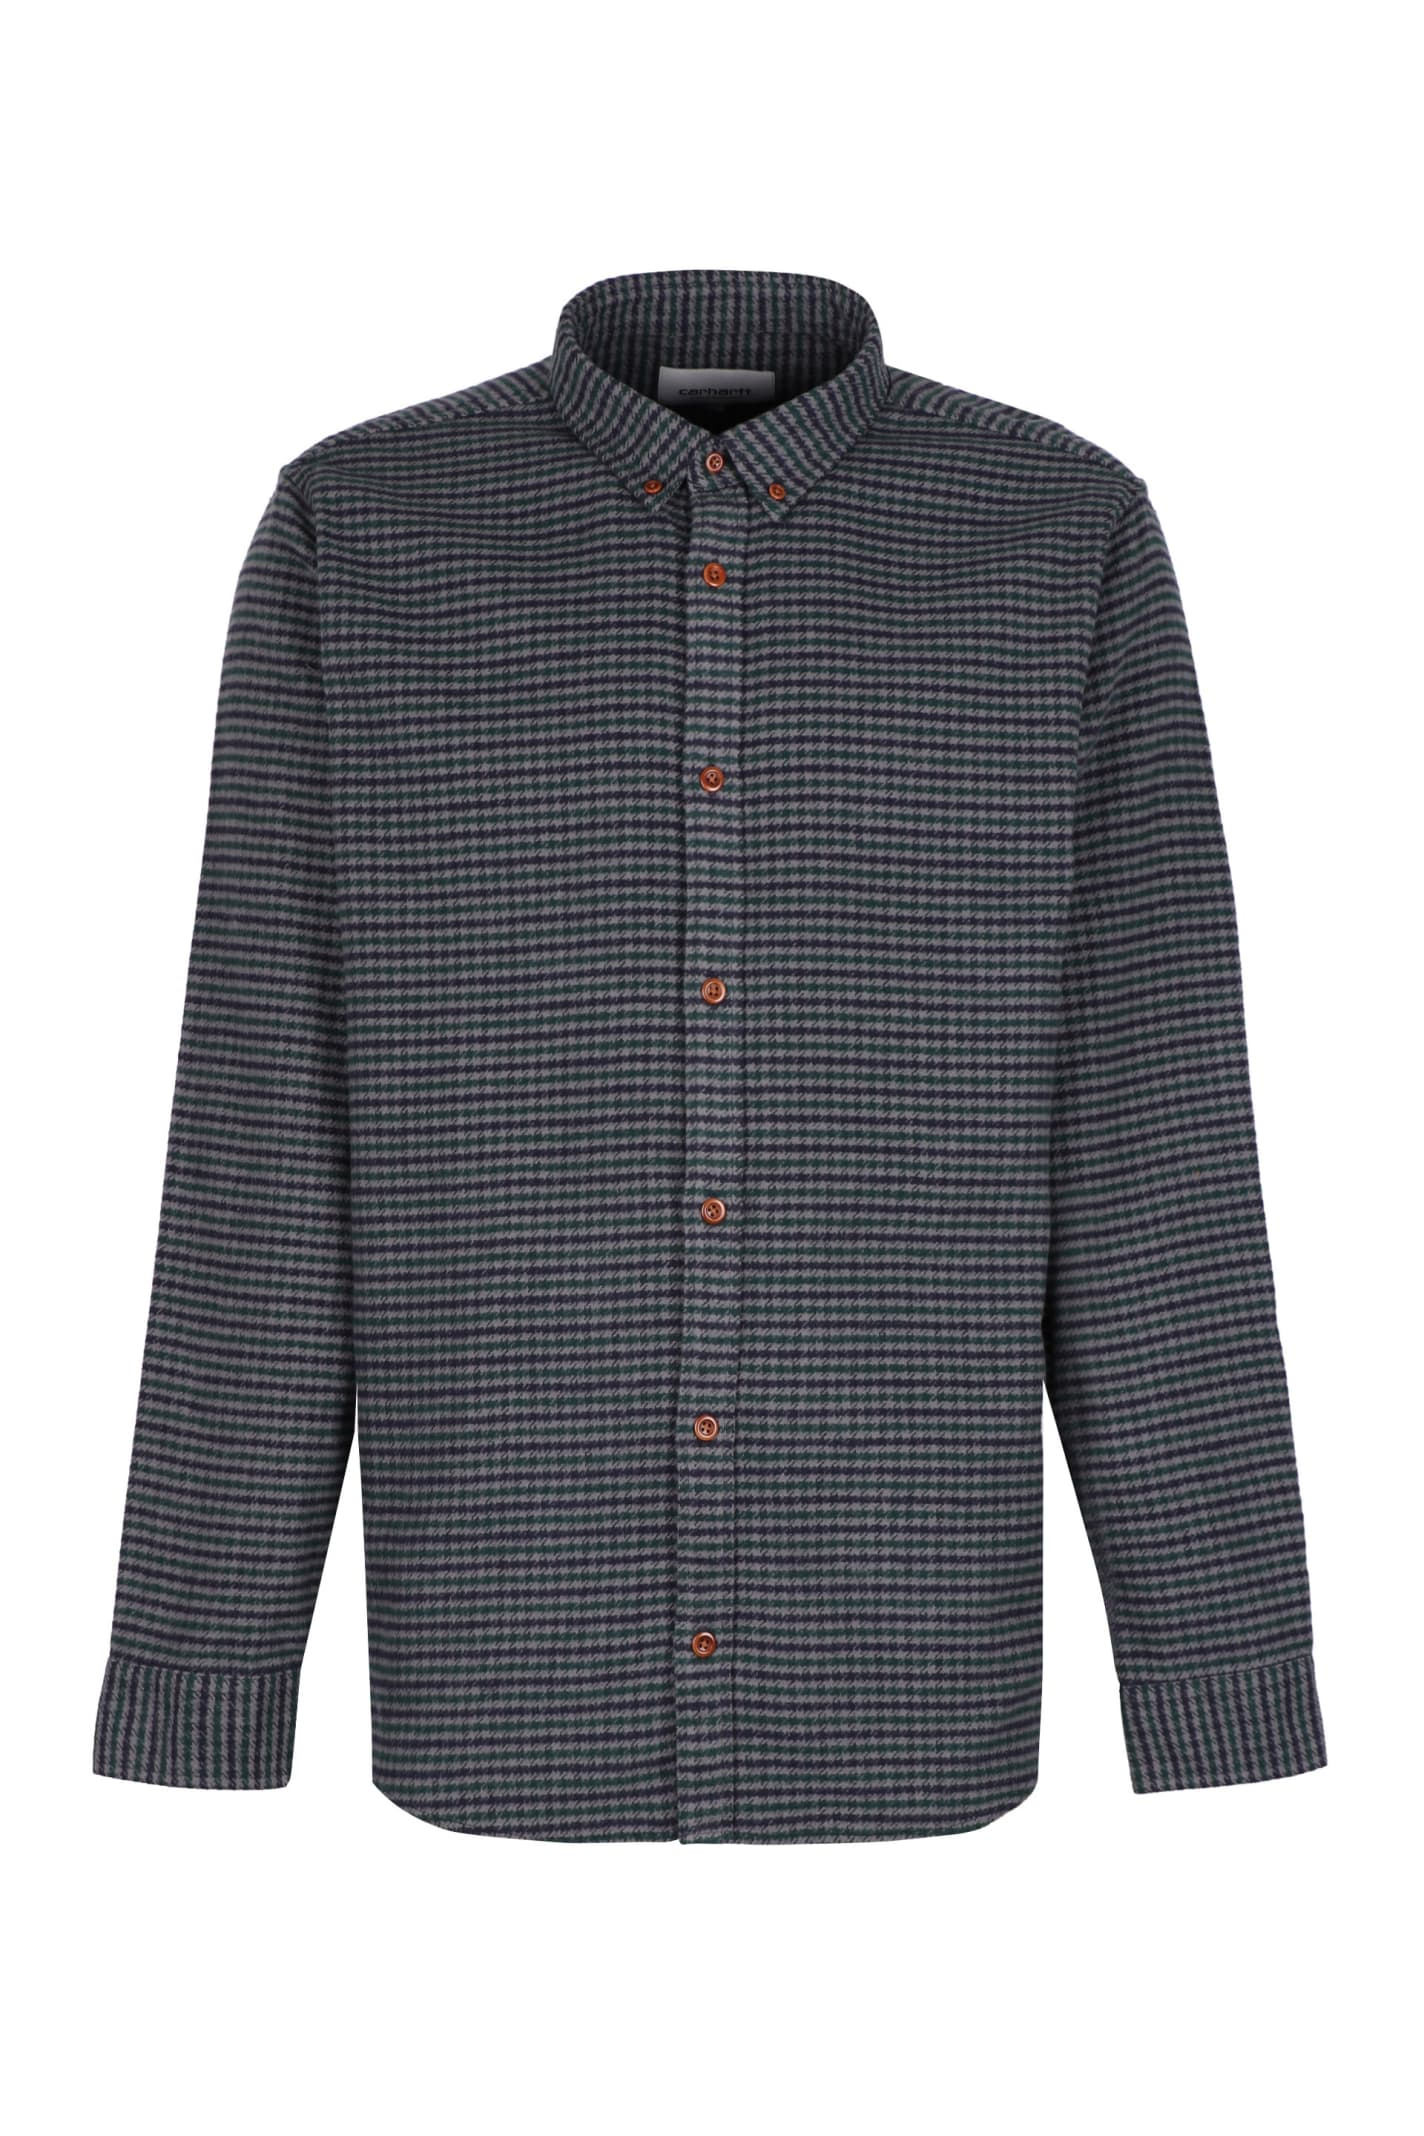 Thorne Striped Cotton Shirt